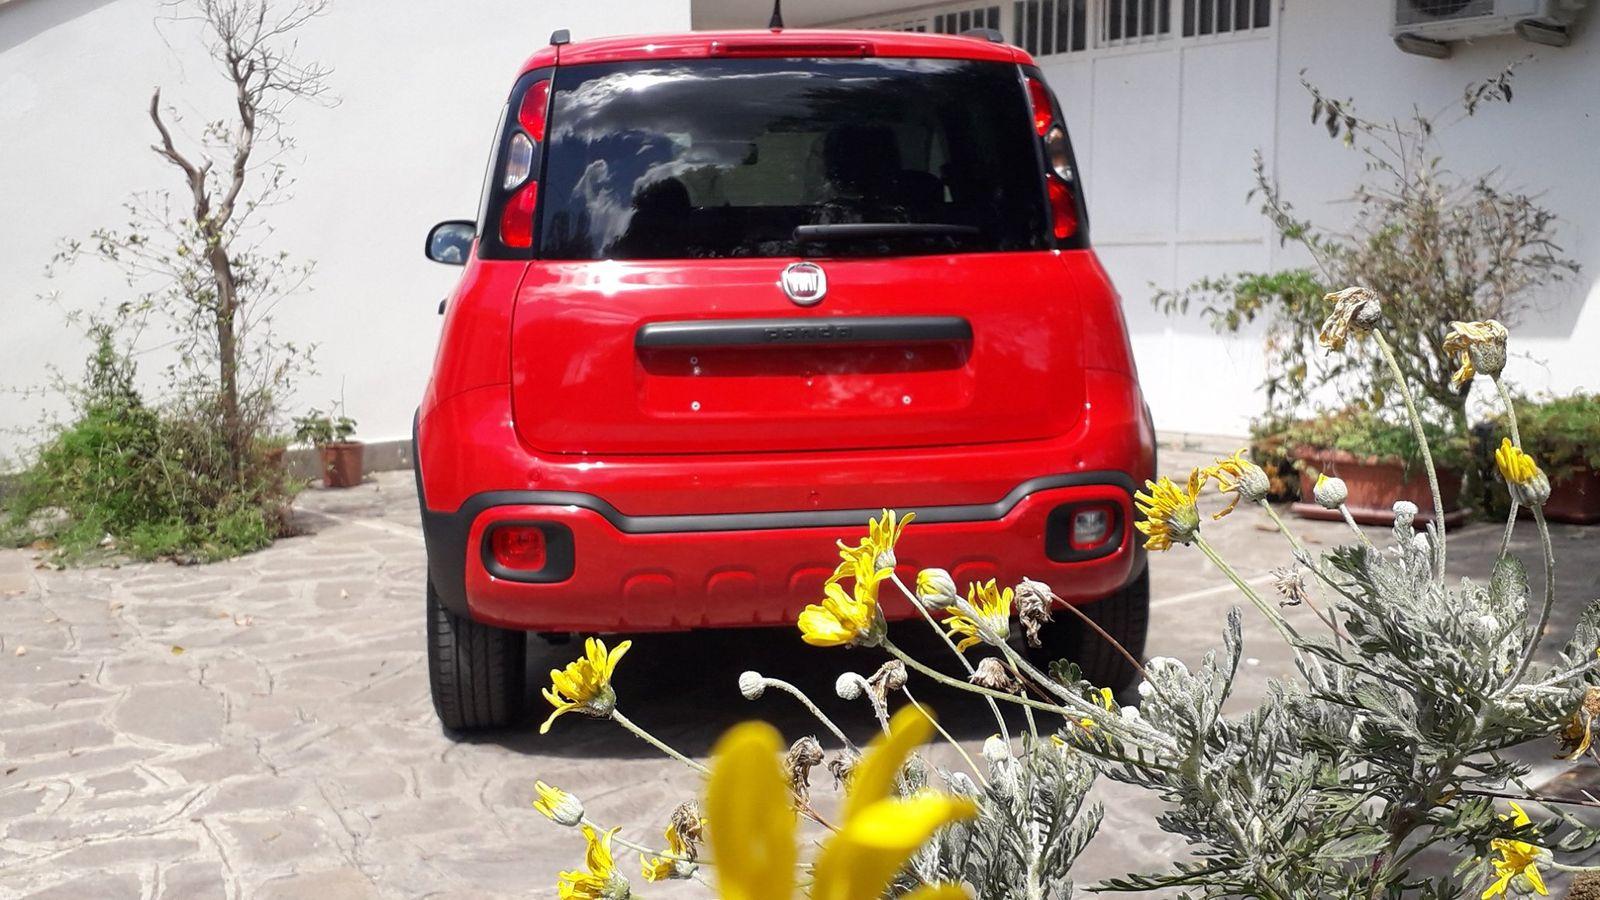 Fiat Panda City-Cross 1.2 69CV EURO 6d S&S, sensori, €. 11.900,00